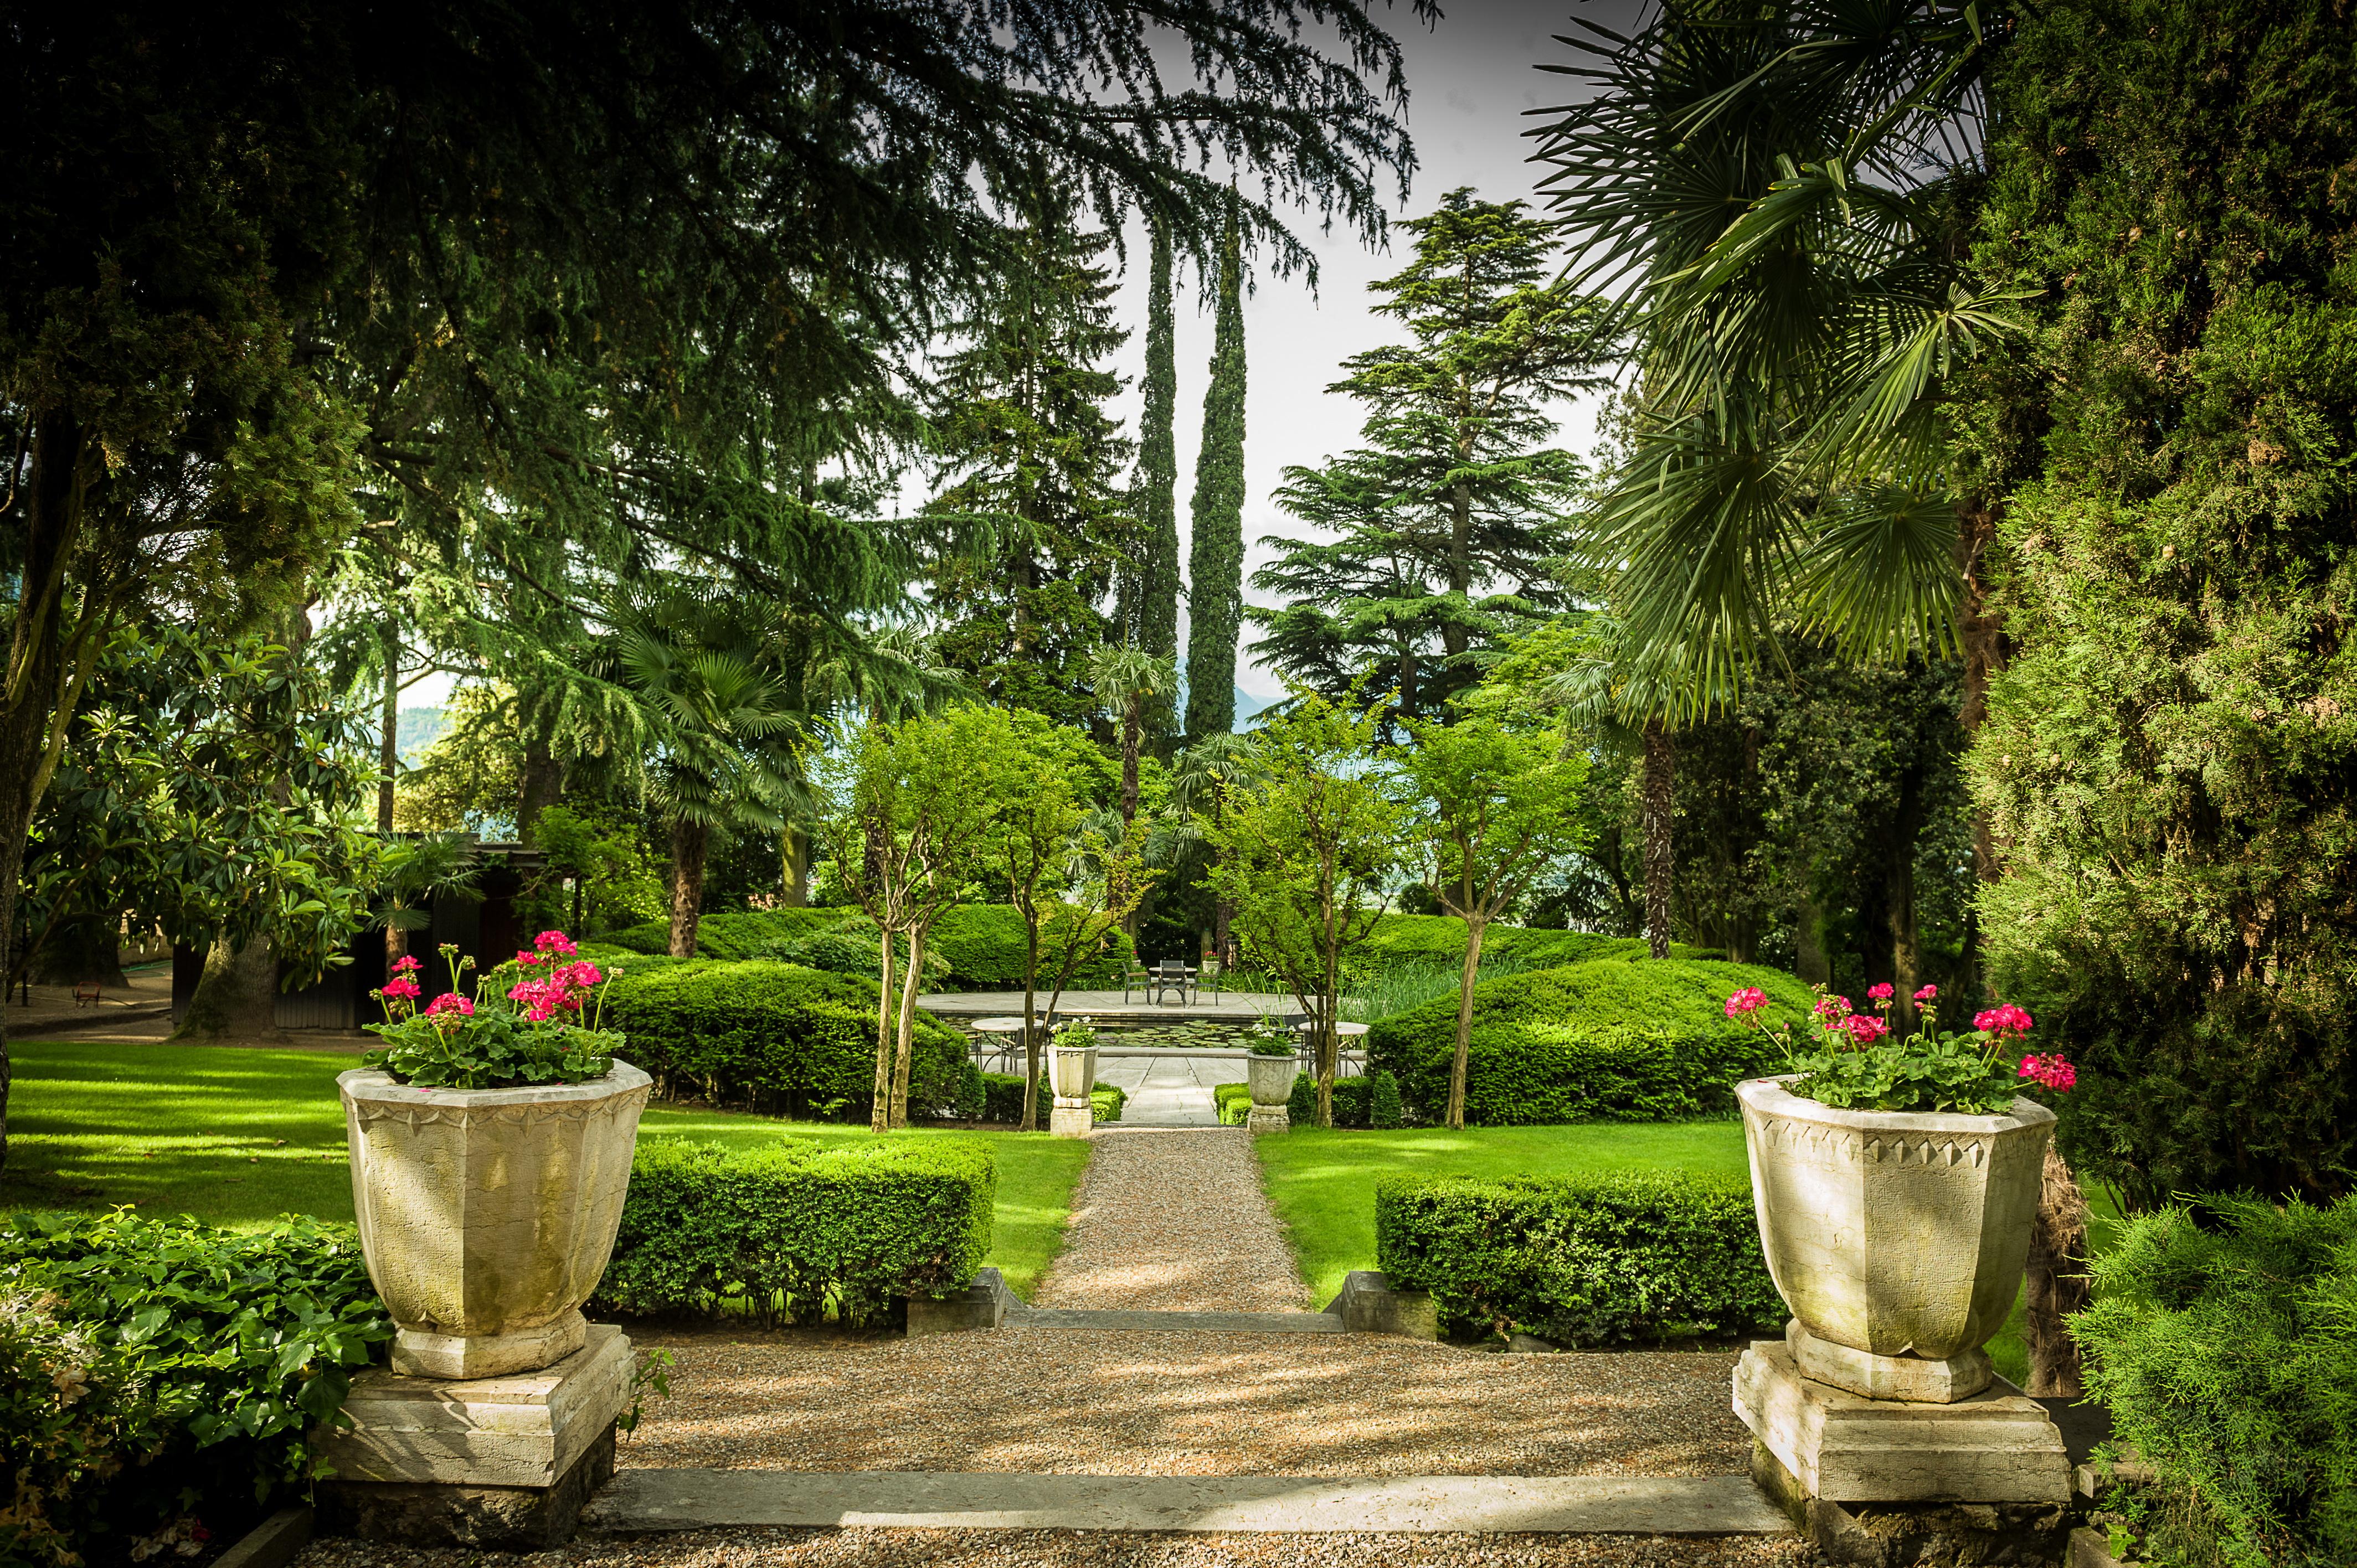 File:Garden Villa Eden.jpg - Wikimedia Commons